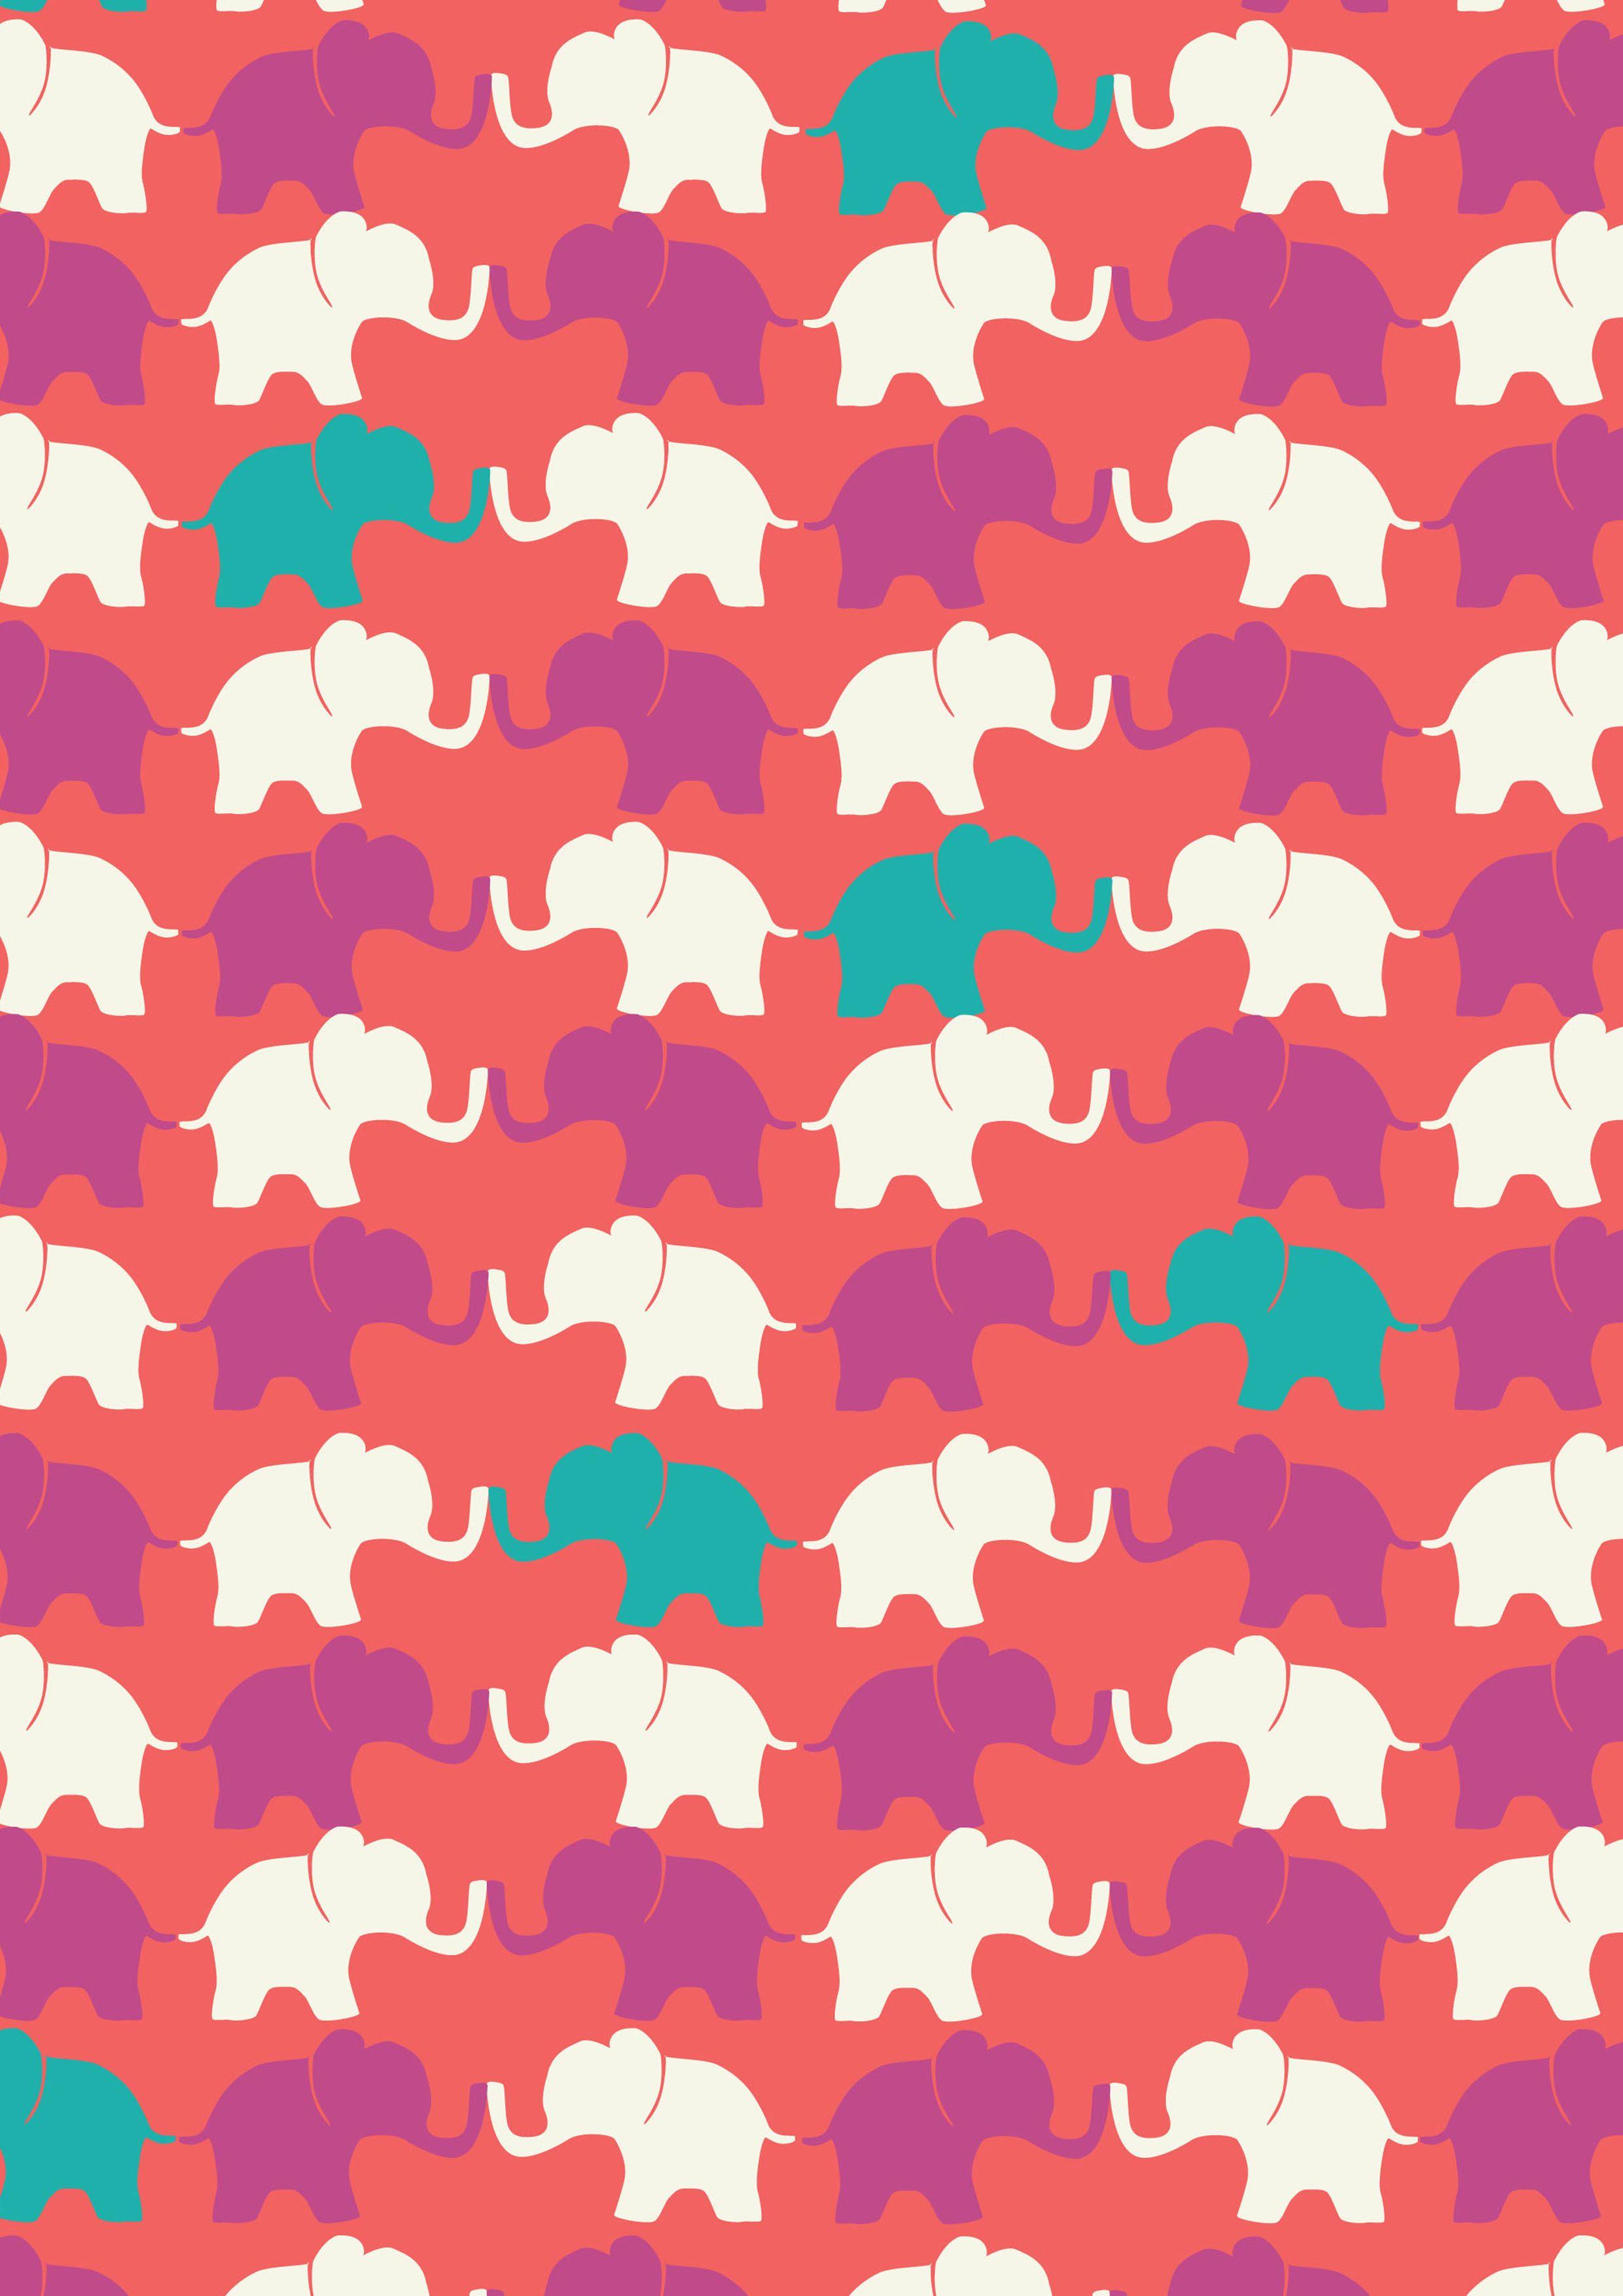 Elephant iphone wallpaper tumblr - Collage